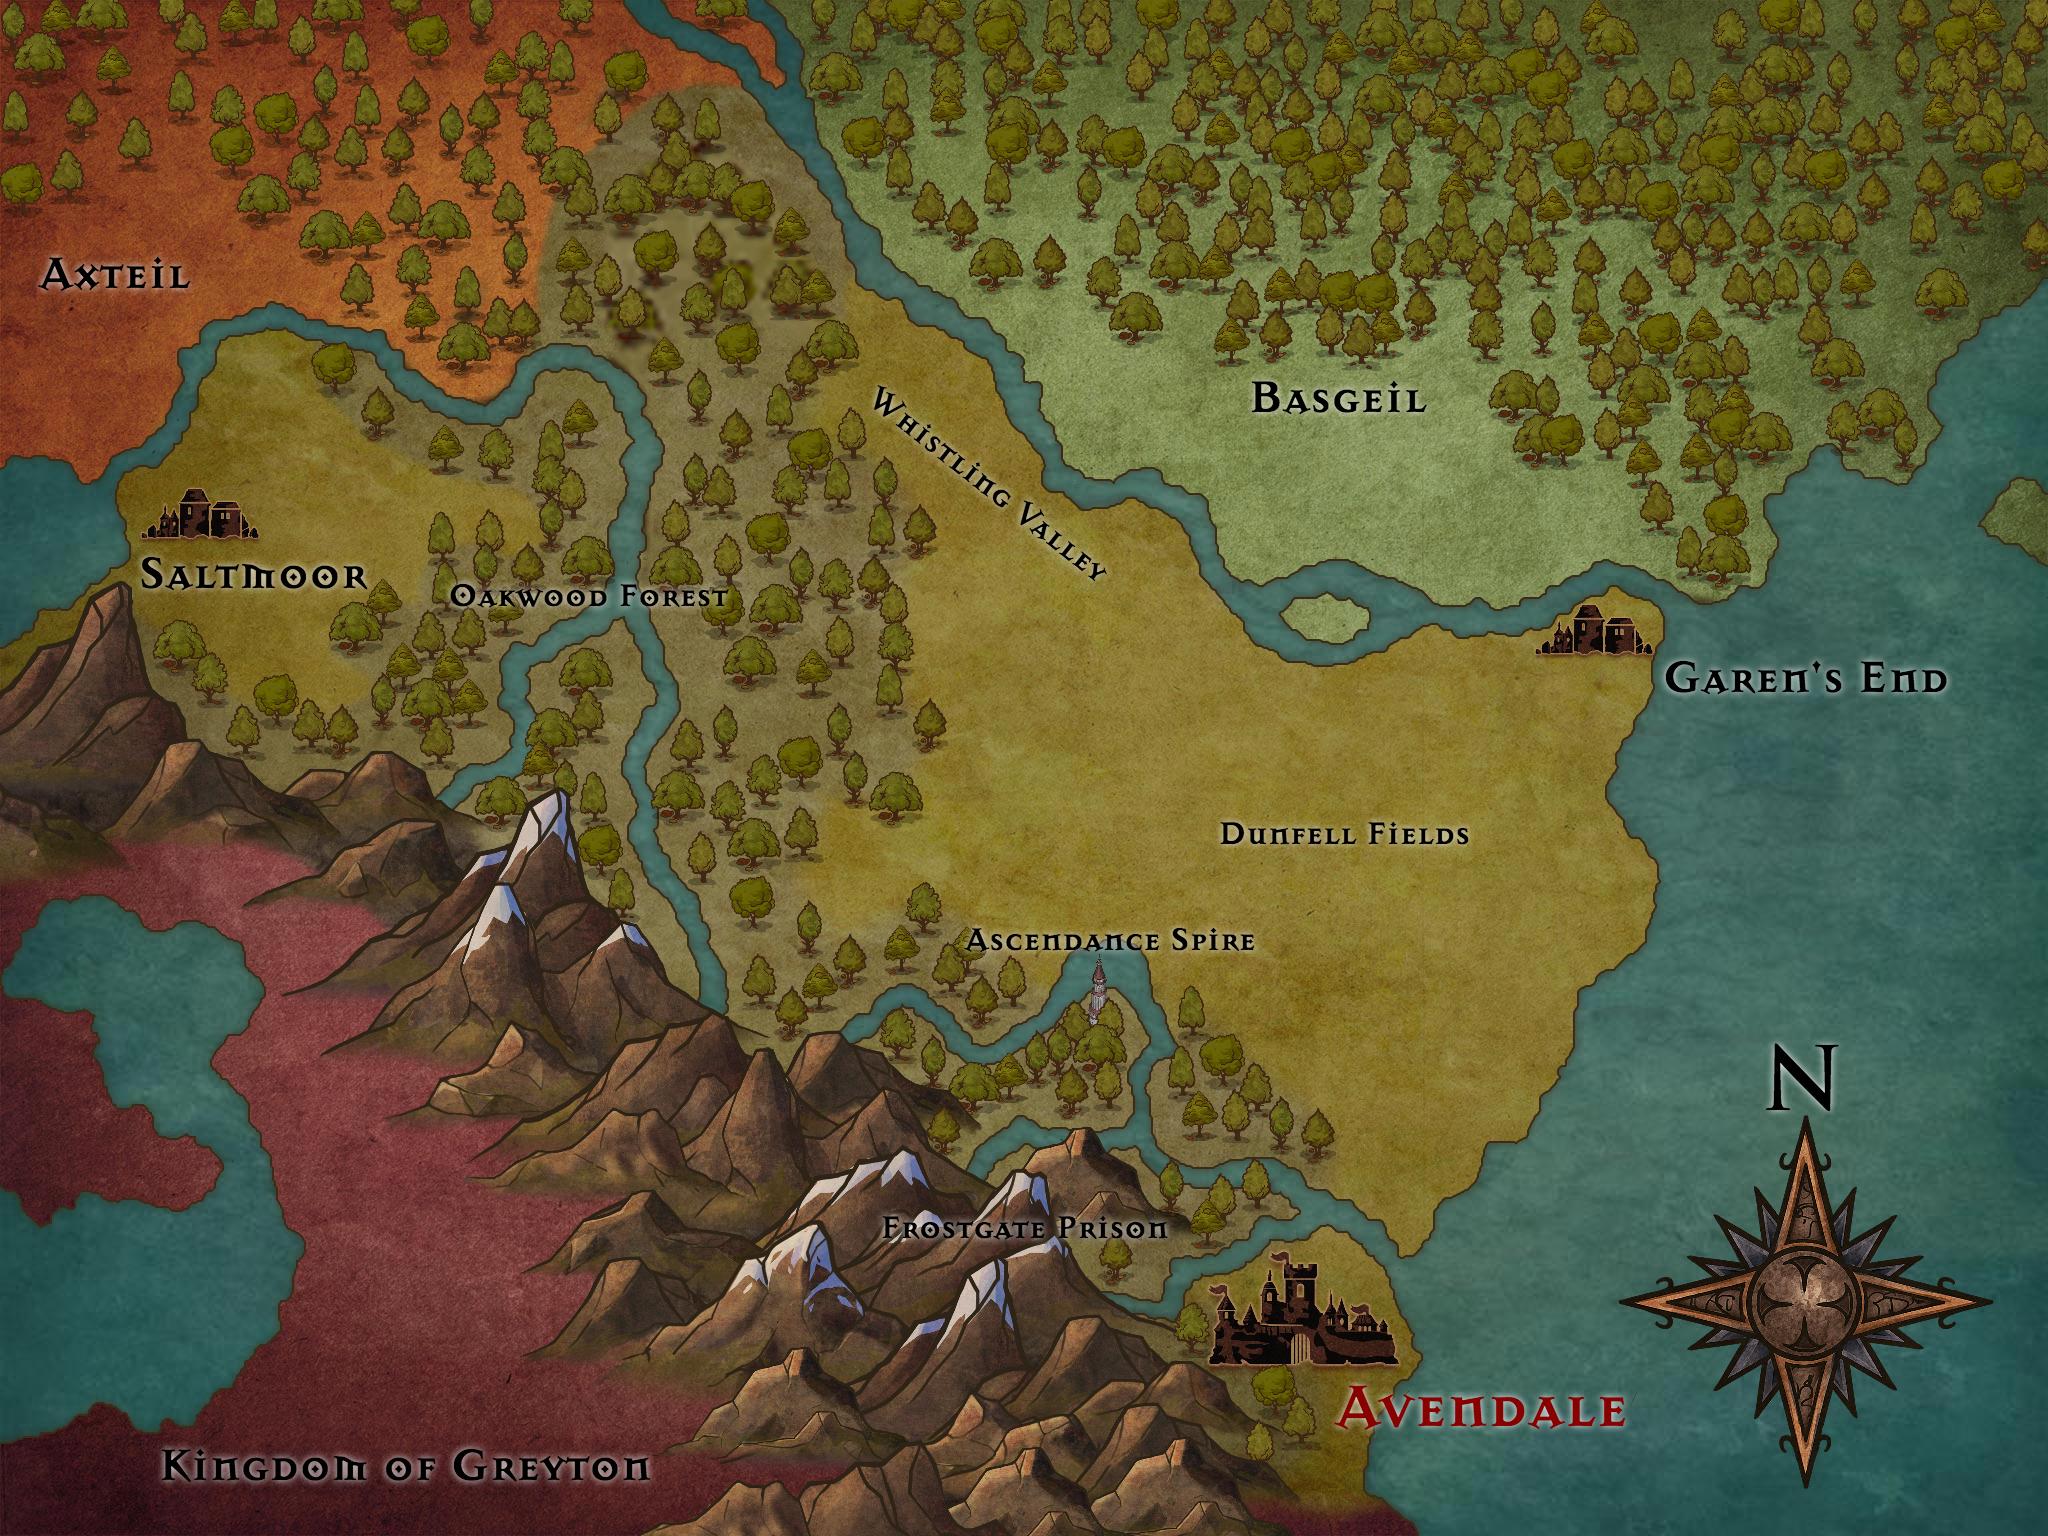 Map_of_Avenell.jpg